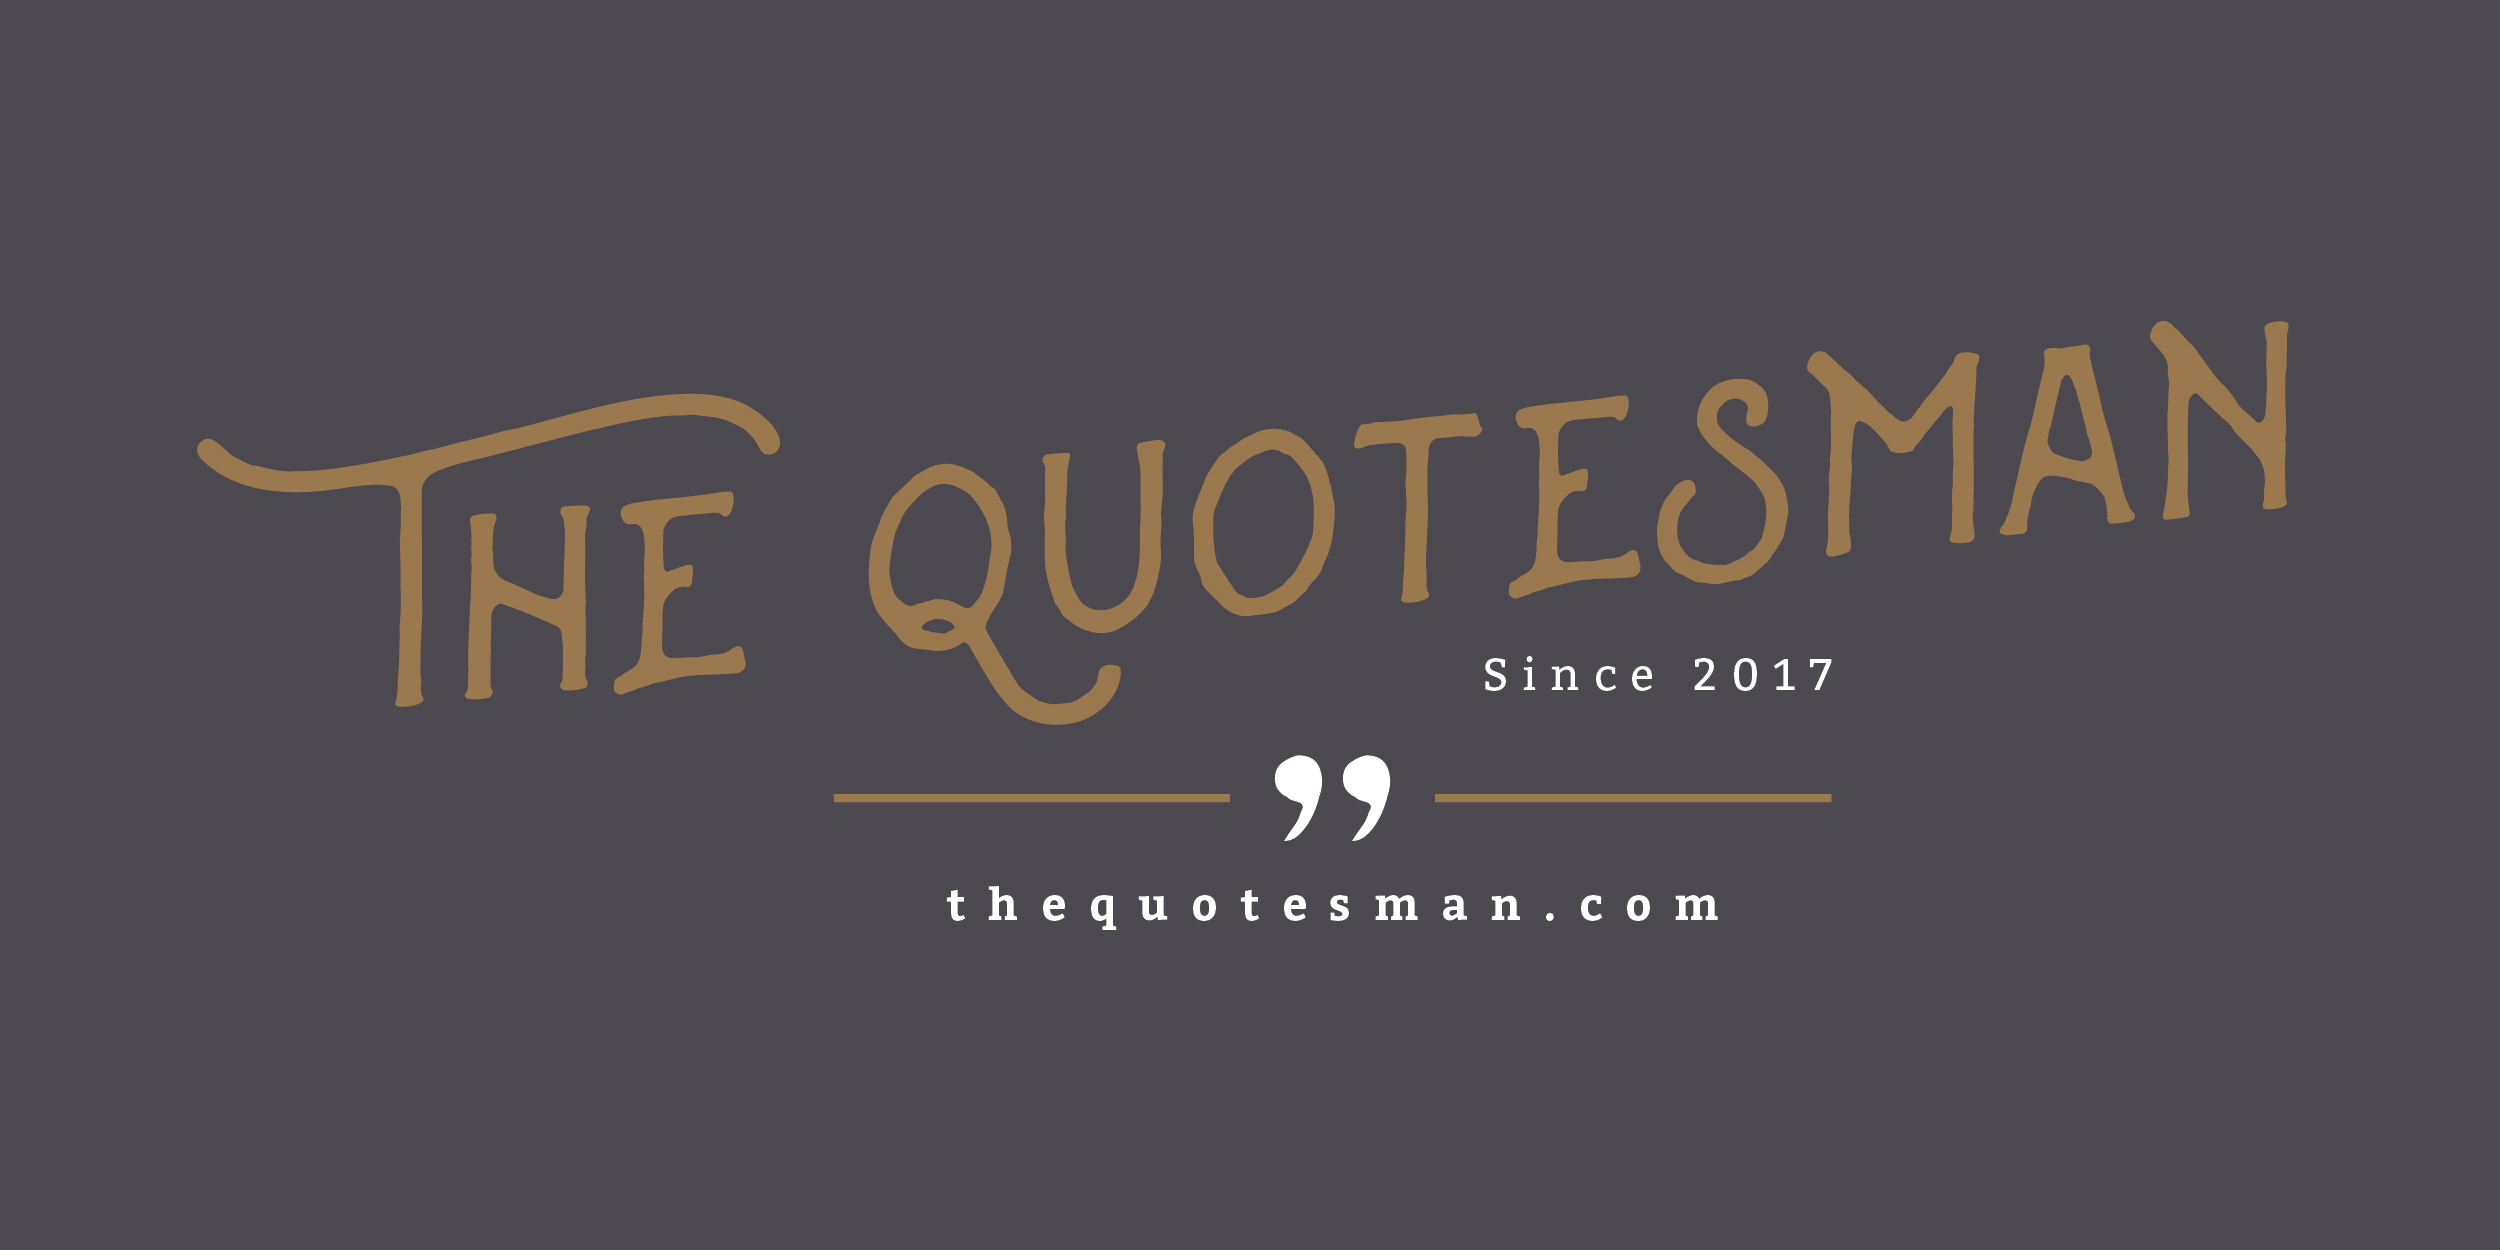 the_quotesman-01.jpg